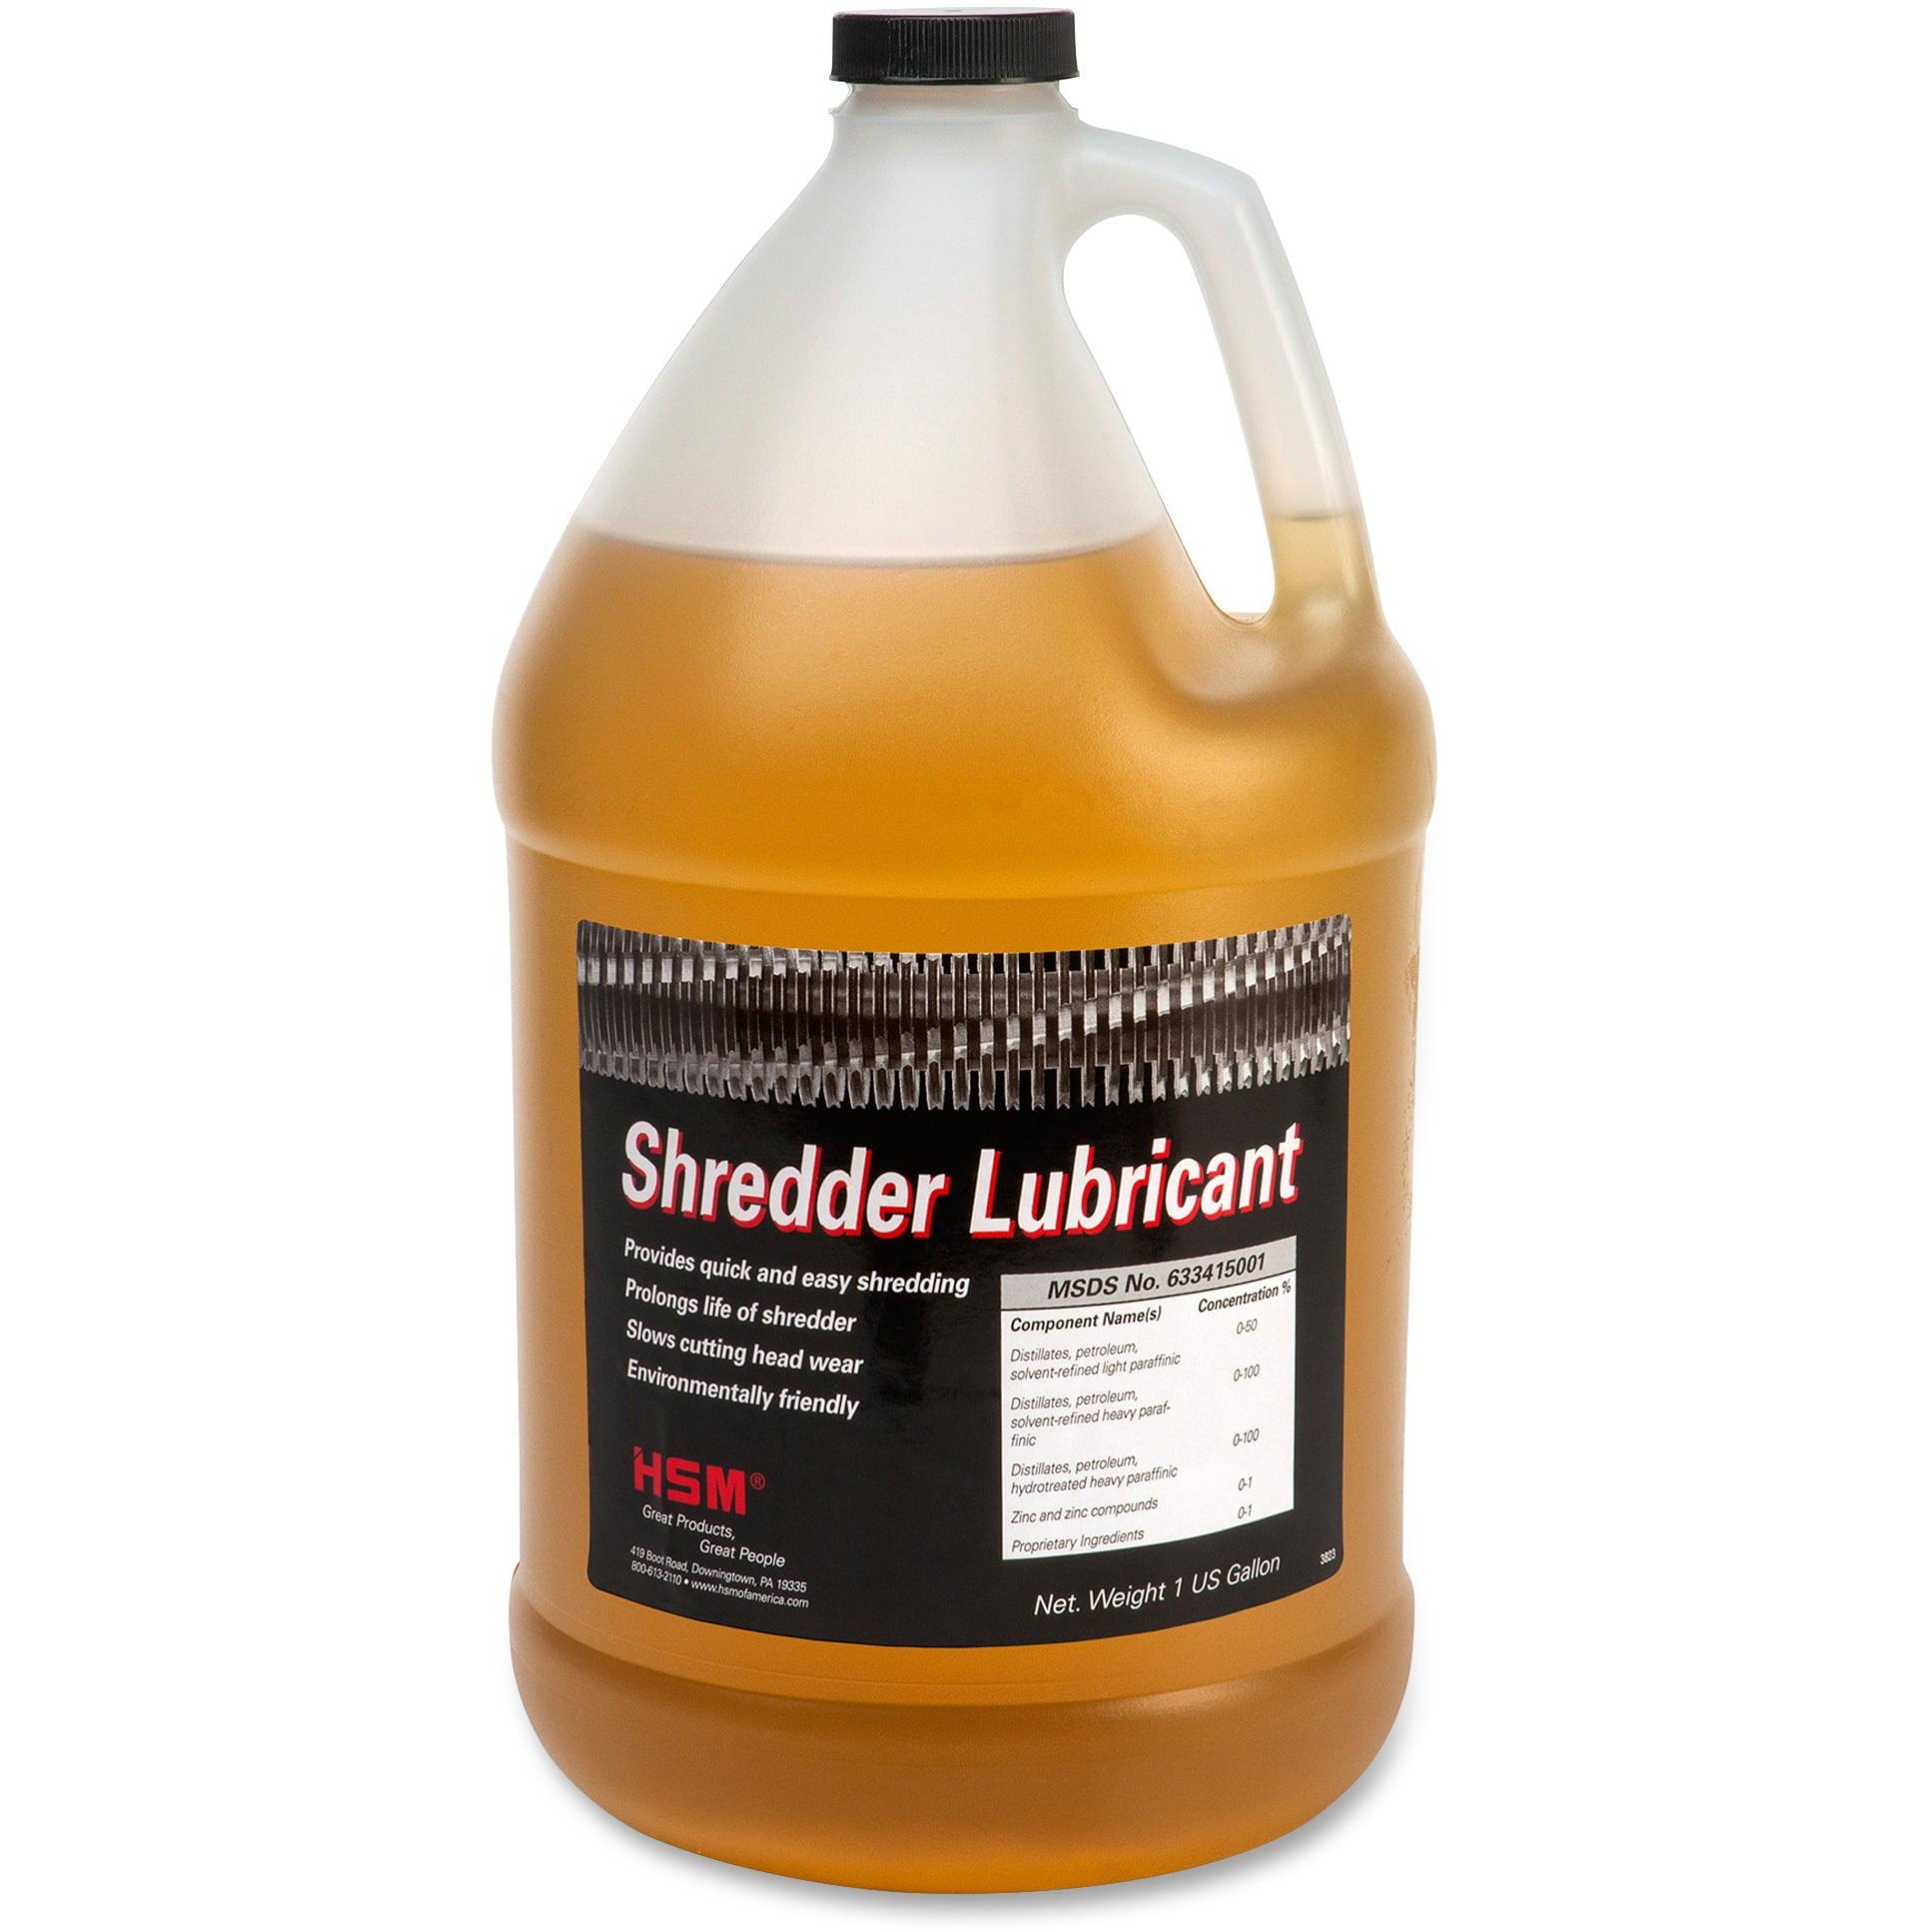 HSM, HSM315, Gallon Shredder Oil, 1 Each, Amber